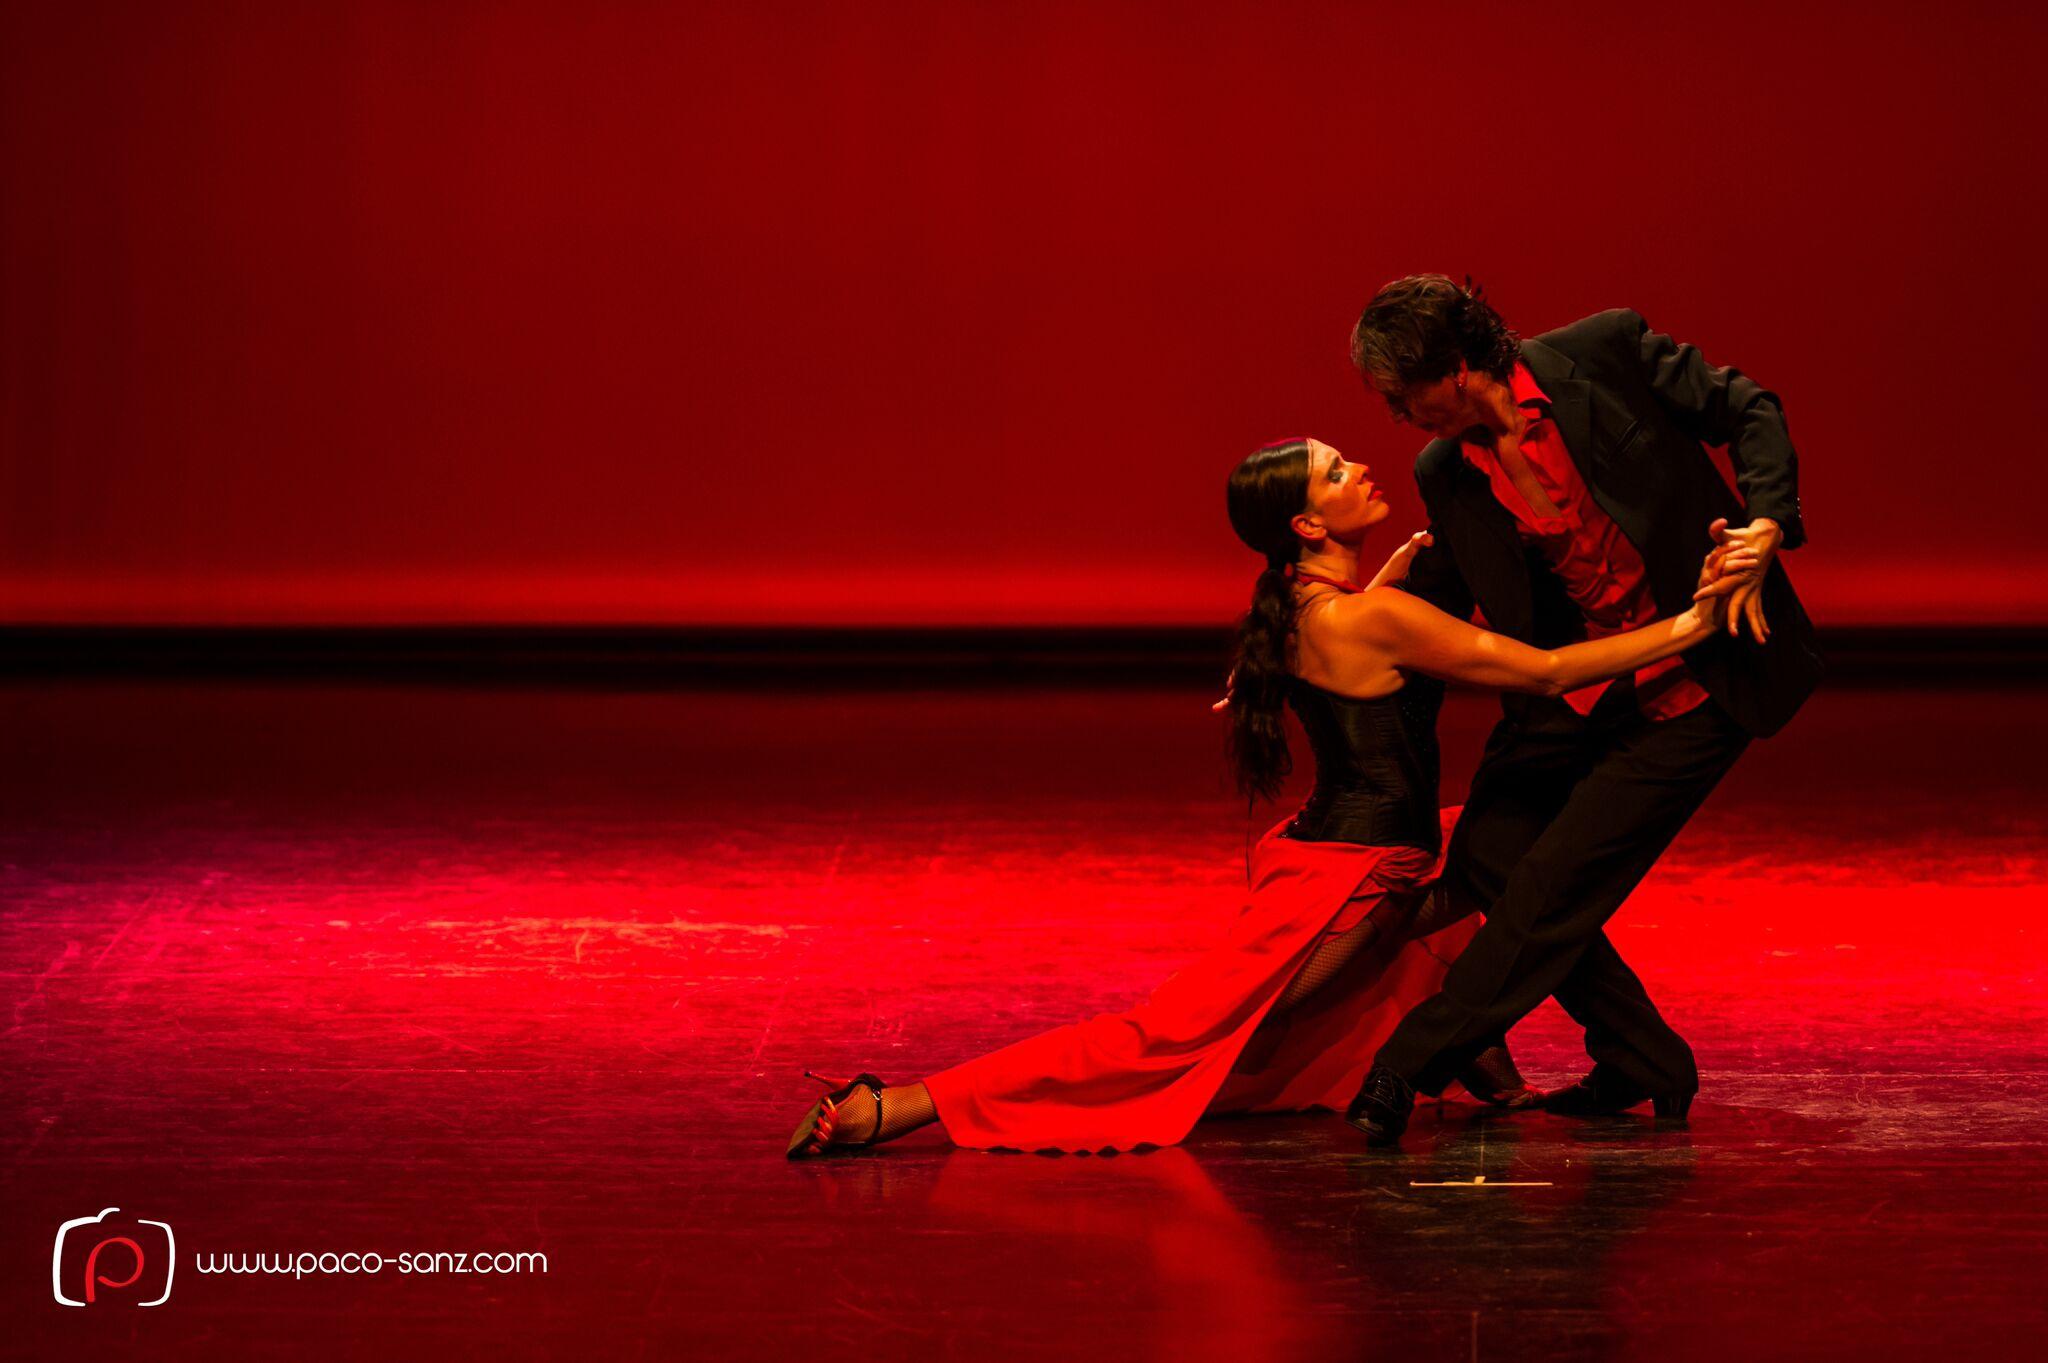 TANGO!! Una noche especial de Tango mit großer TANGOSHOW mit Milton y Romina